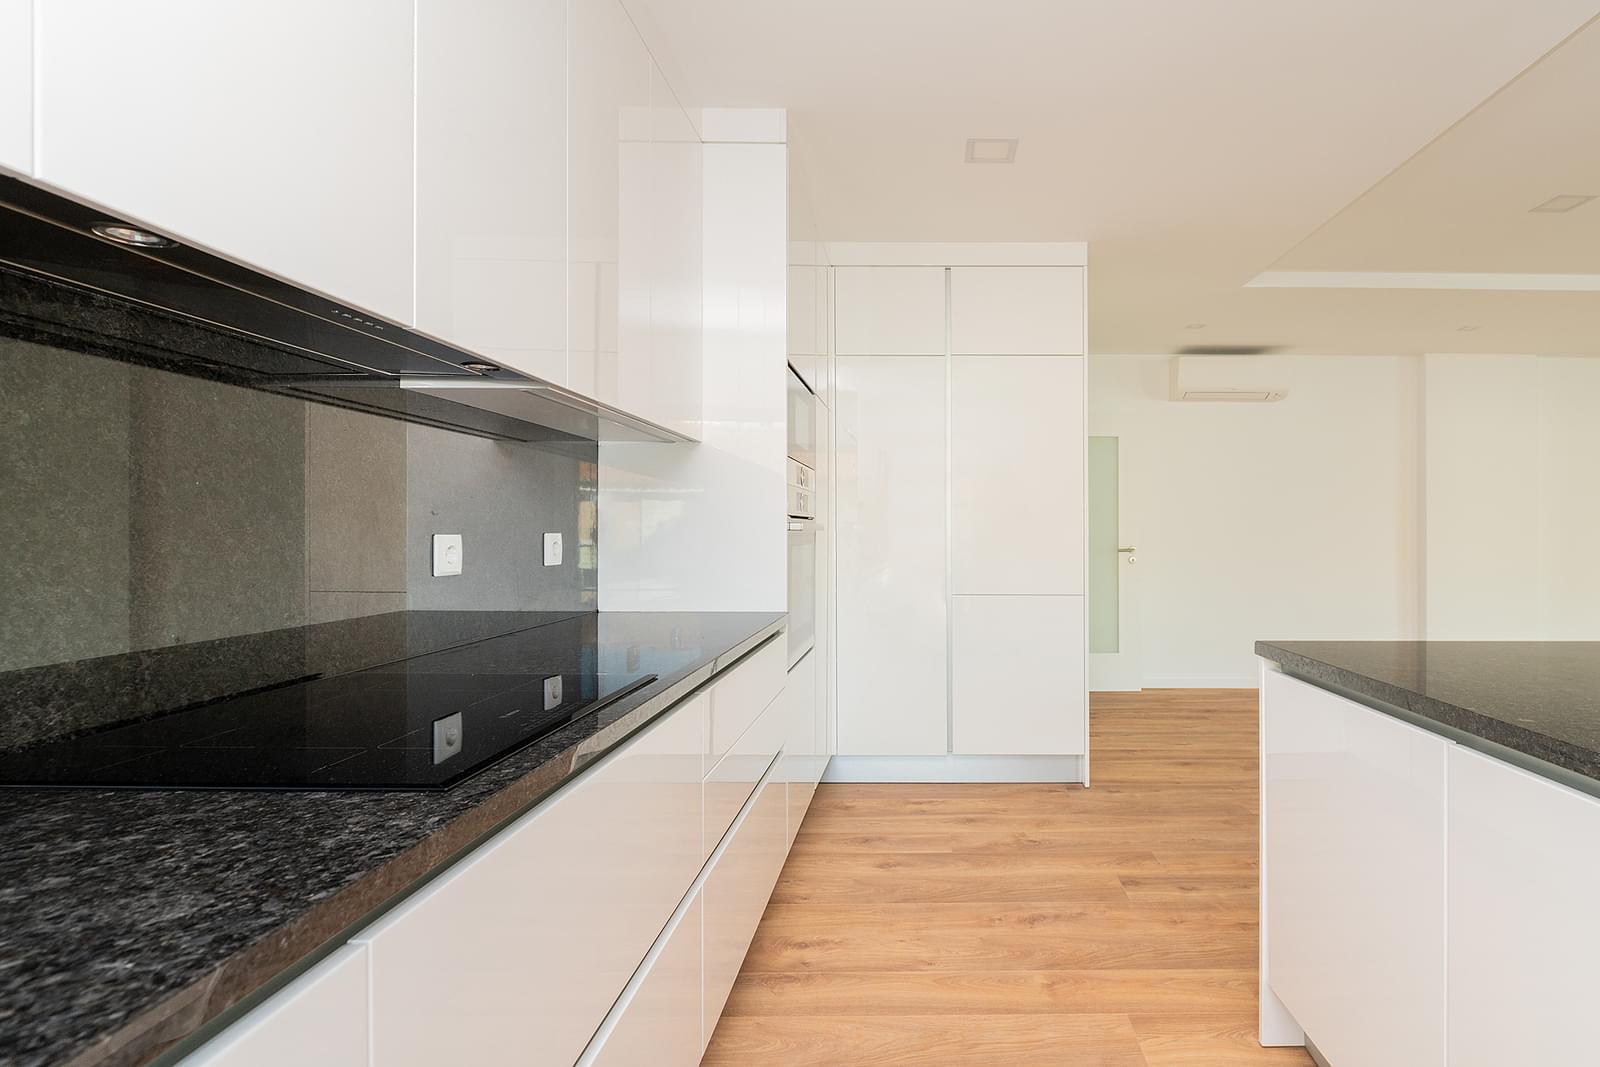 pf16829-apartamento-t1-lisboa-81bc6b0e-e8e4-48f4-8aec-9332cf9c16a6